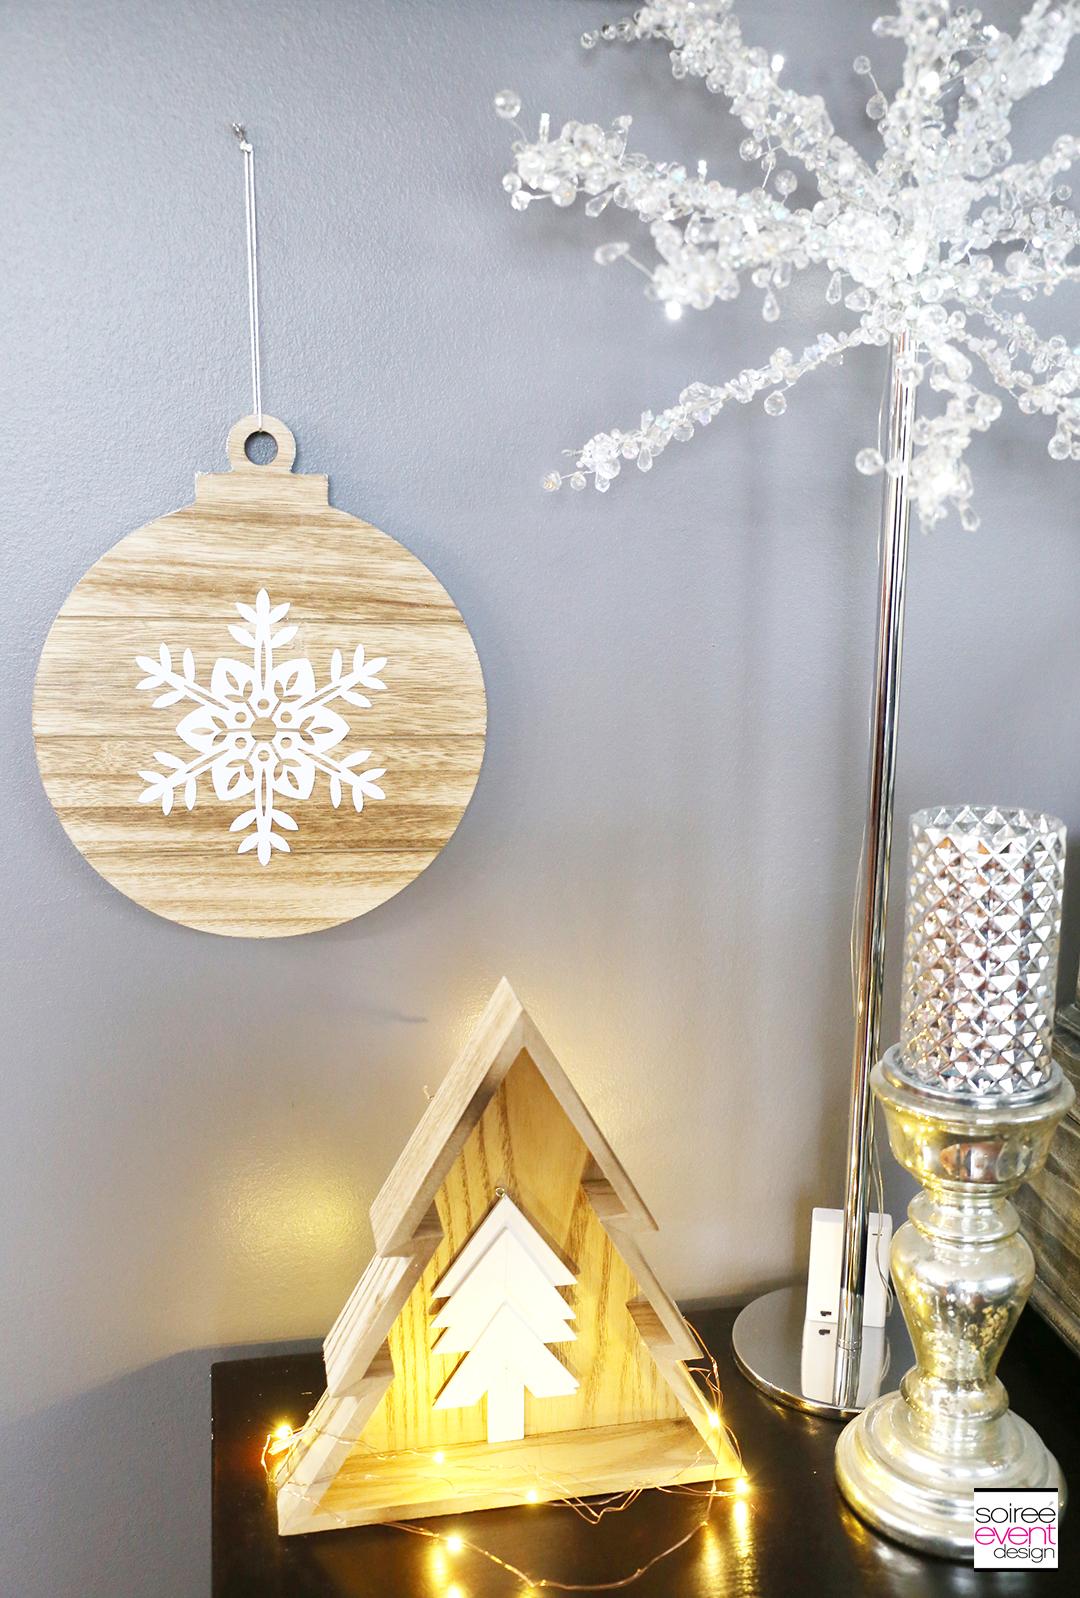 Farmhouse Holiday Decor - LED Crystal Trees